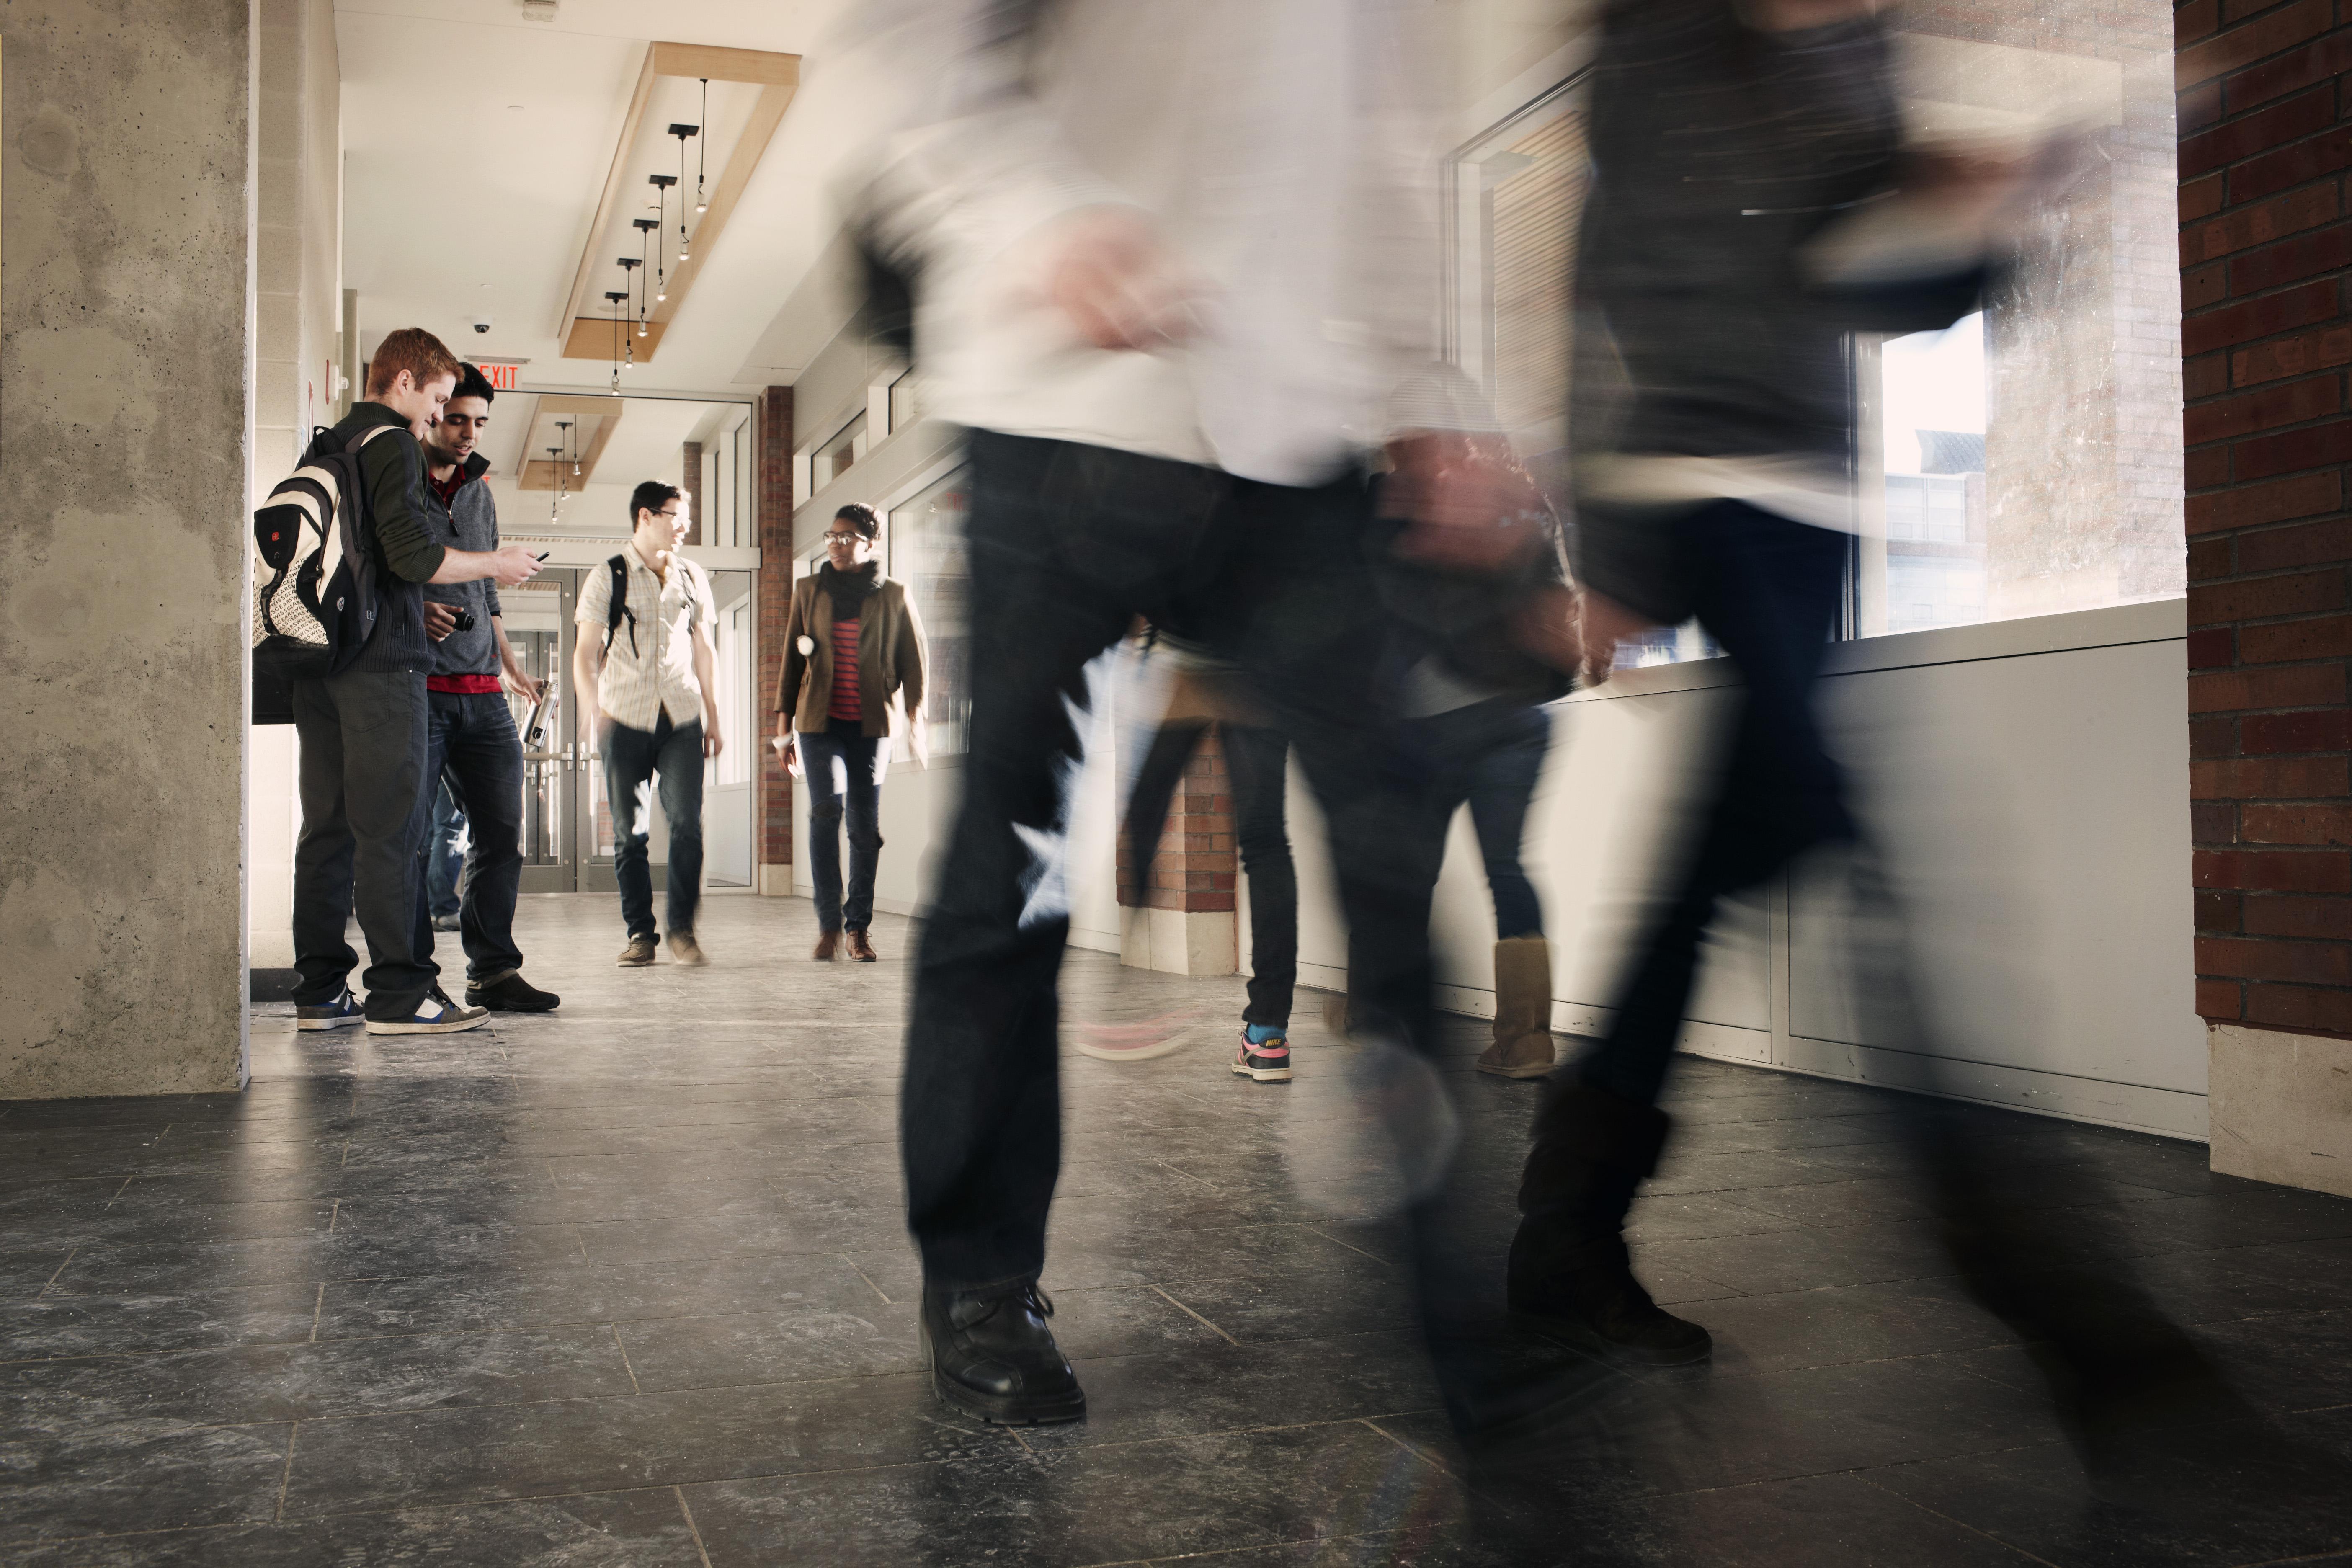 Students walking in a hallway